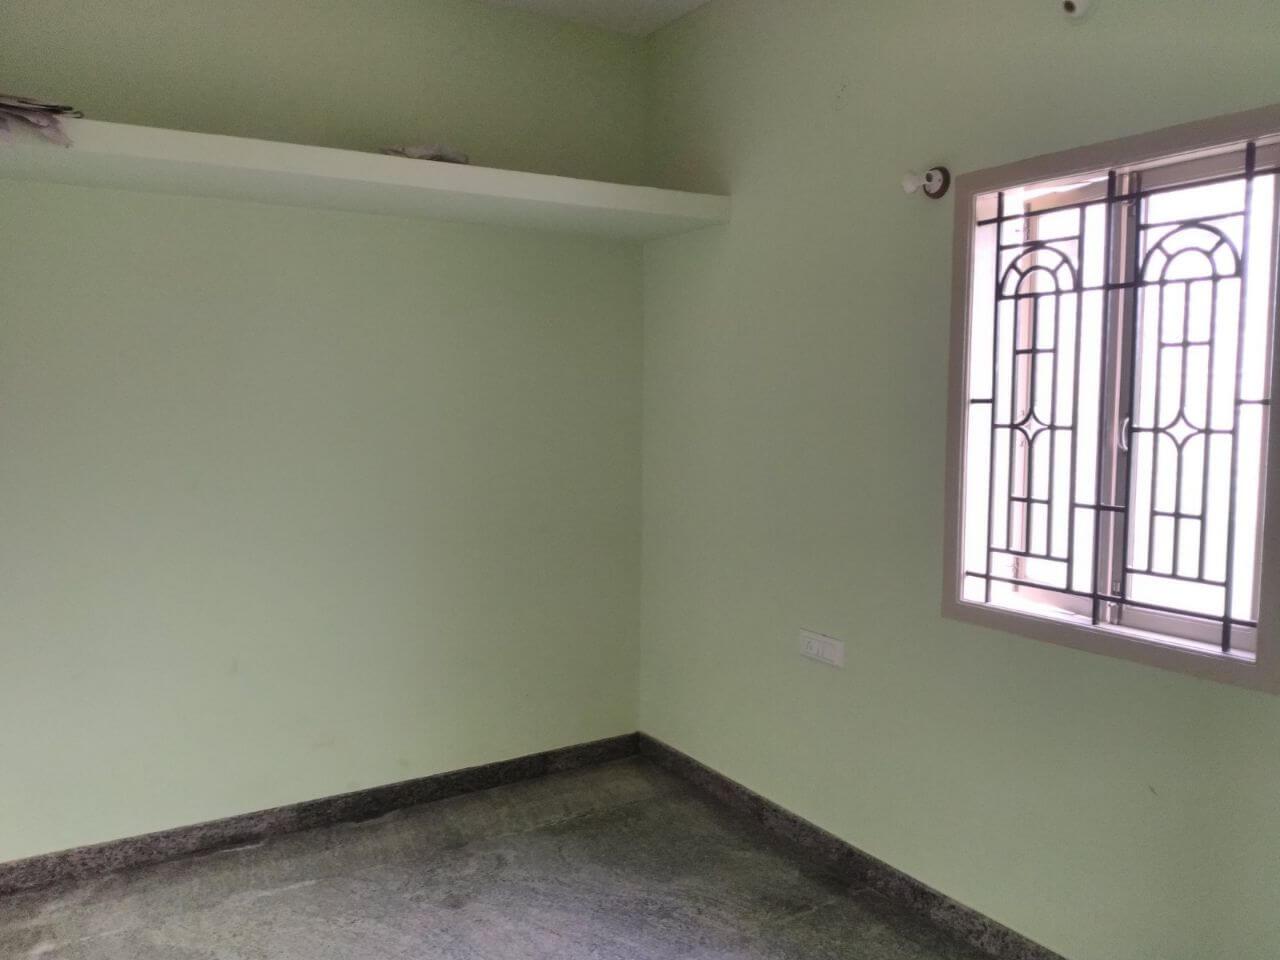 1 BHK individual house is available for lease at Kodigehalli Gollarahatti